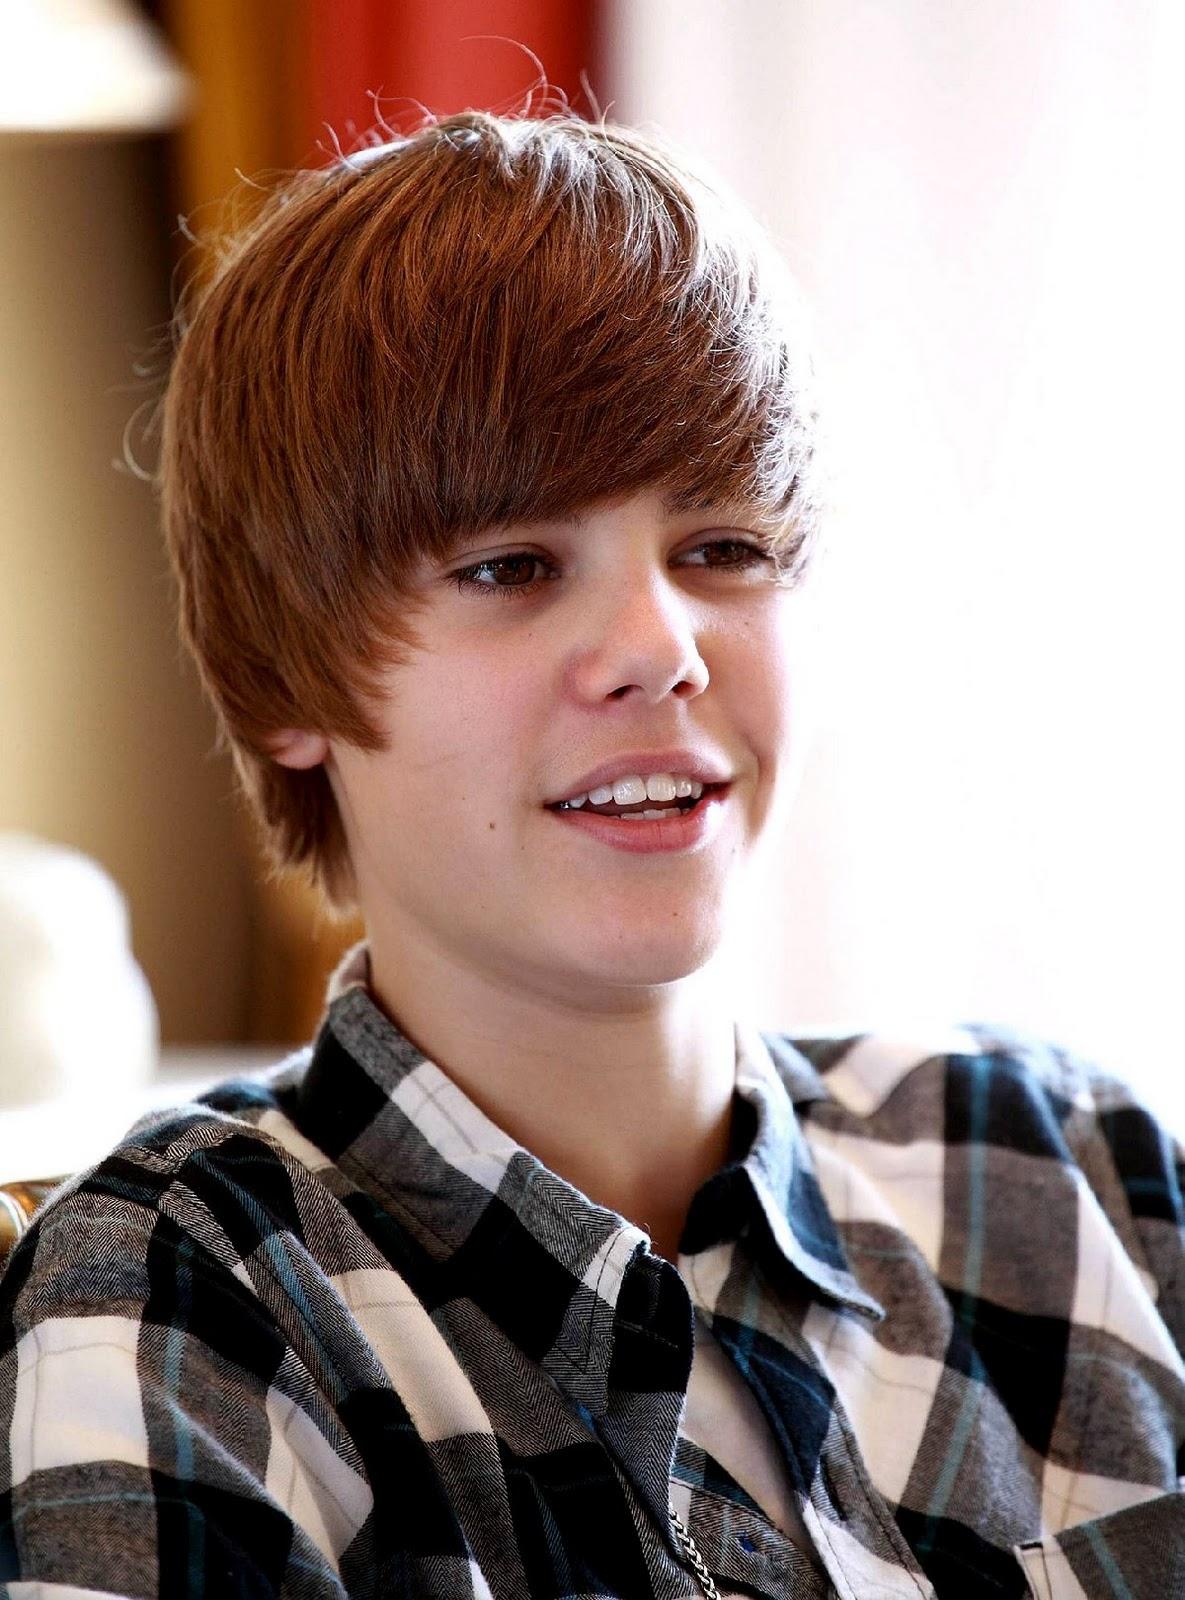 Justin bieber scrapbook ideas - Hairstyles Jorge Boladomoo Justin Bieber Fashion For A New Style Statement